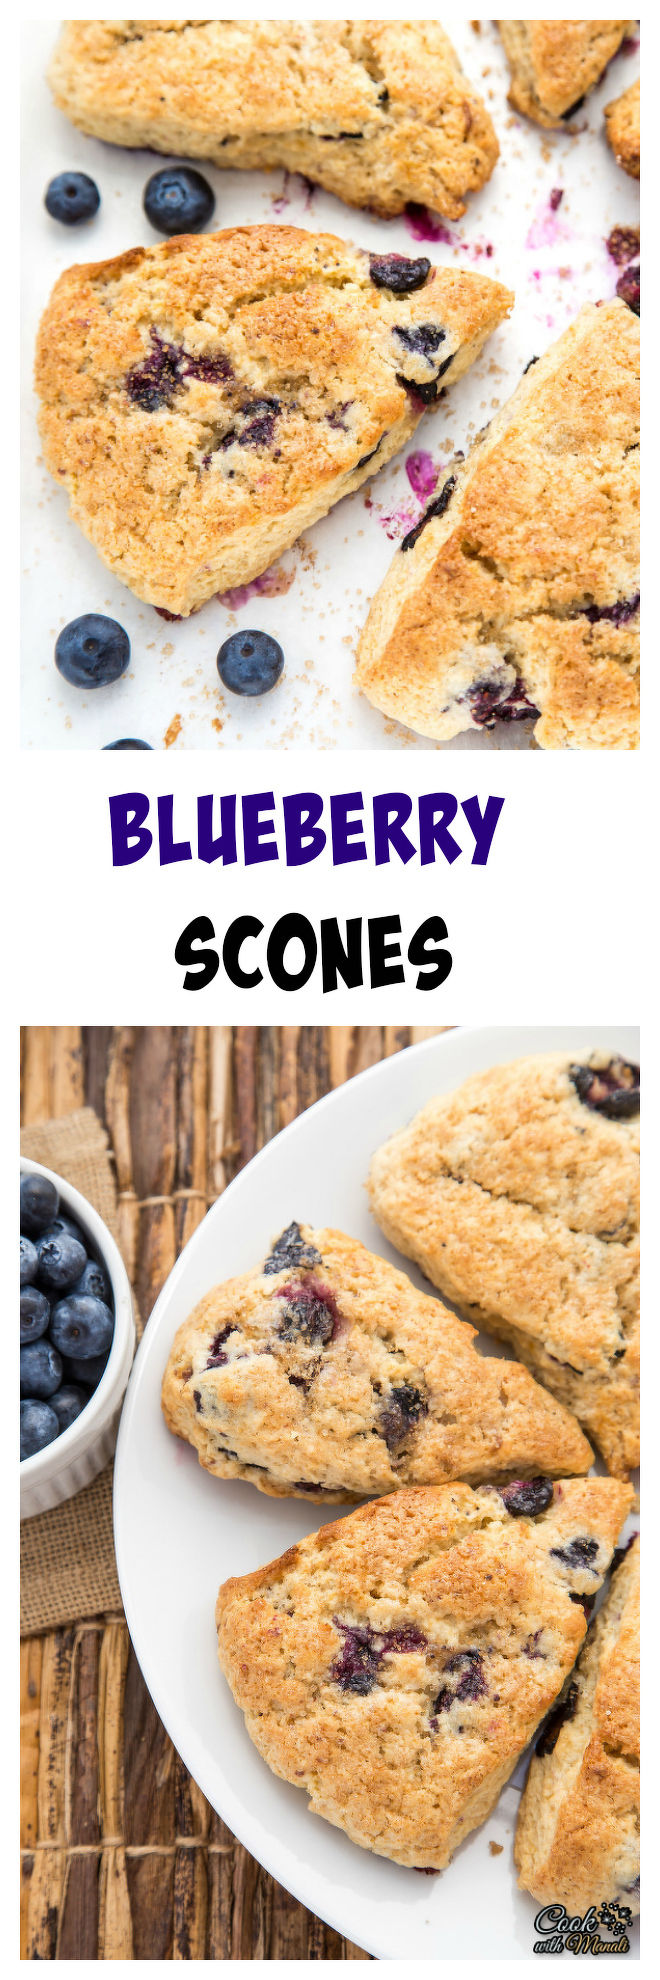 Blueberry-Scones-Collage-nocwm